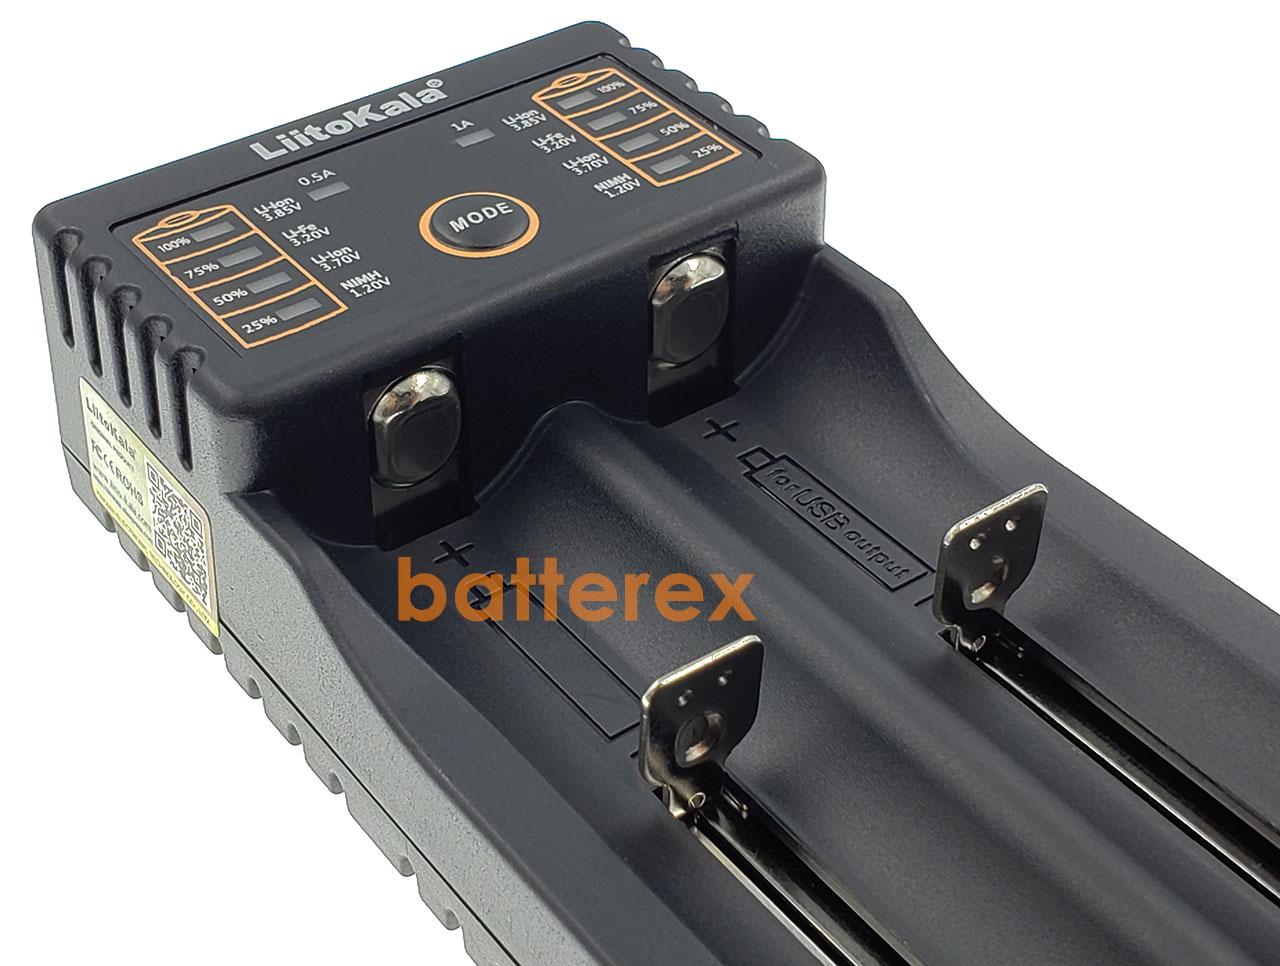 Liitokala Lii-202 купить зарядное устройство